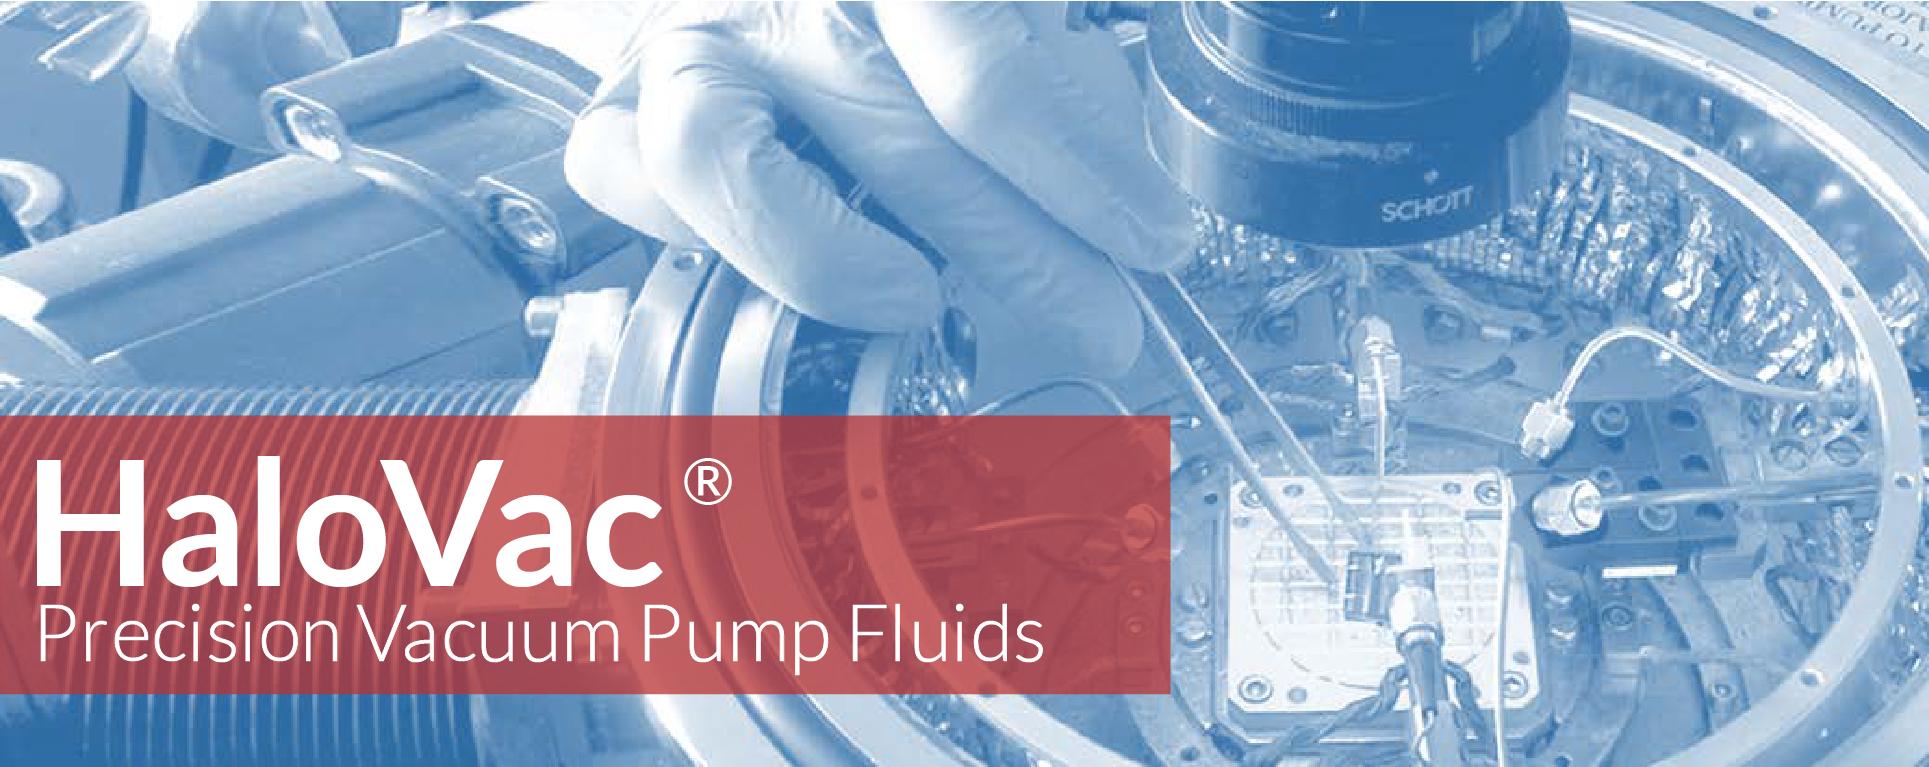 HaloVac® Precision Vacuum Pump Fluids Guide